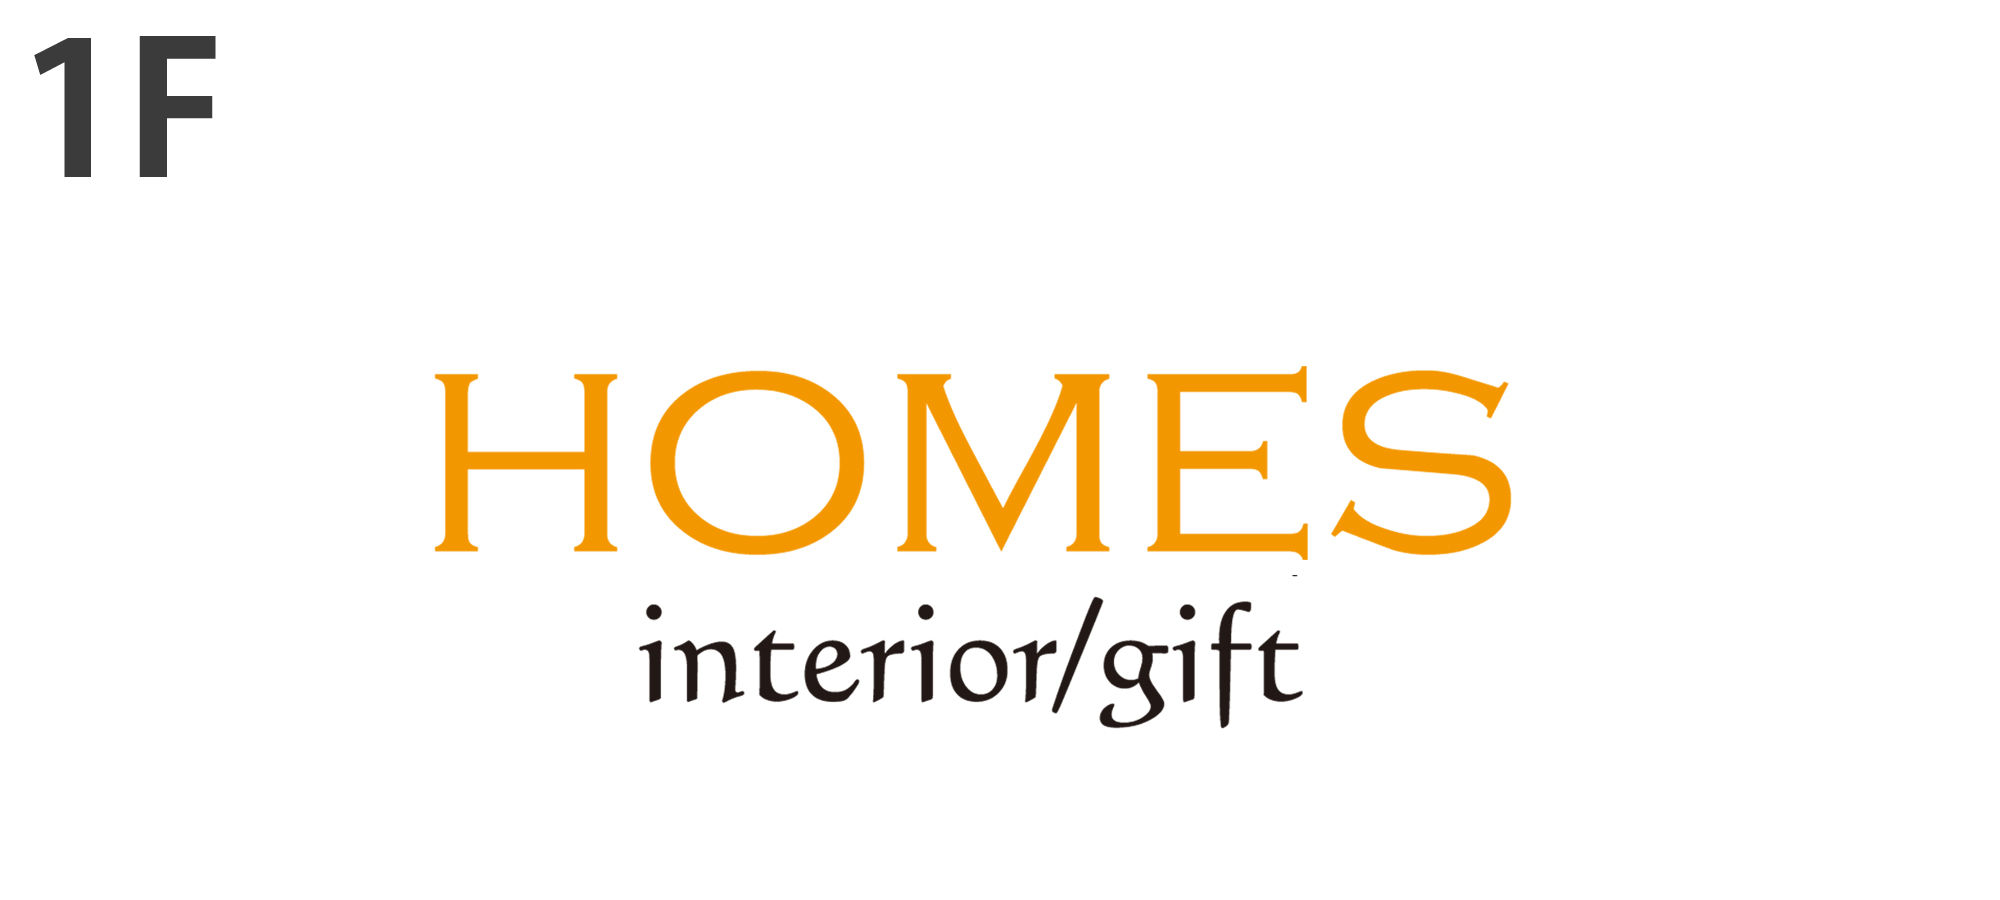 homes interior gift オーダー枕の専門店 ホームズ homes